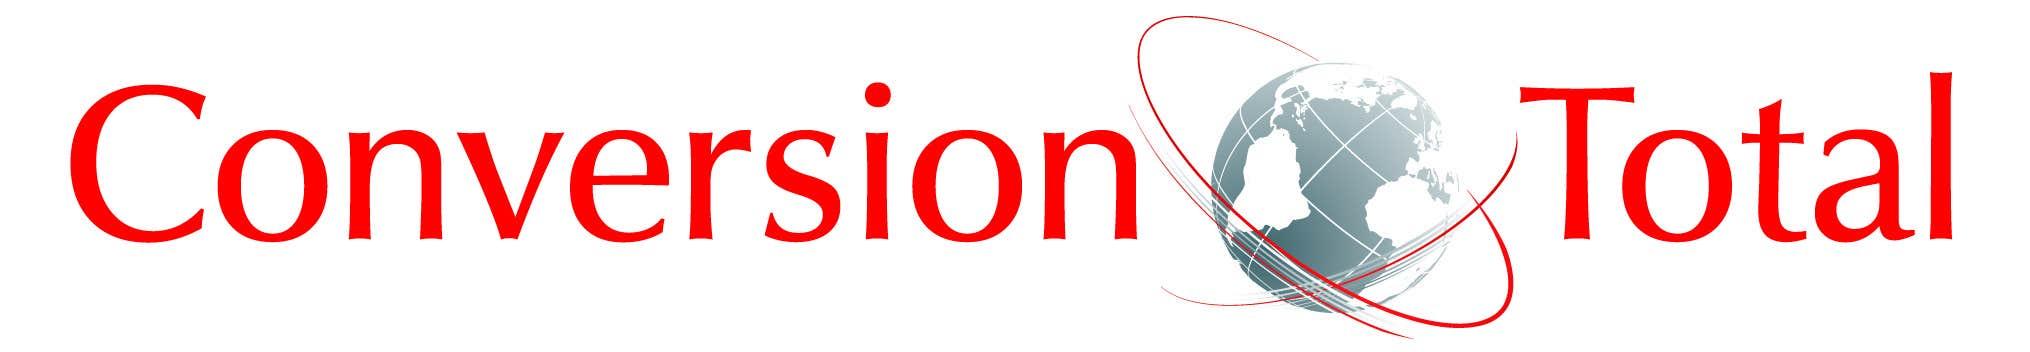 Konkurrenceindlæg #                                        67                                      for                                         Create a logo